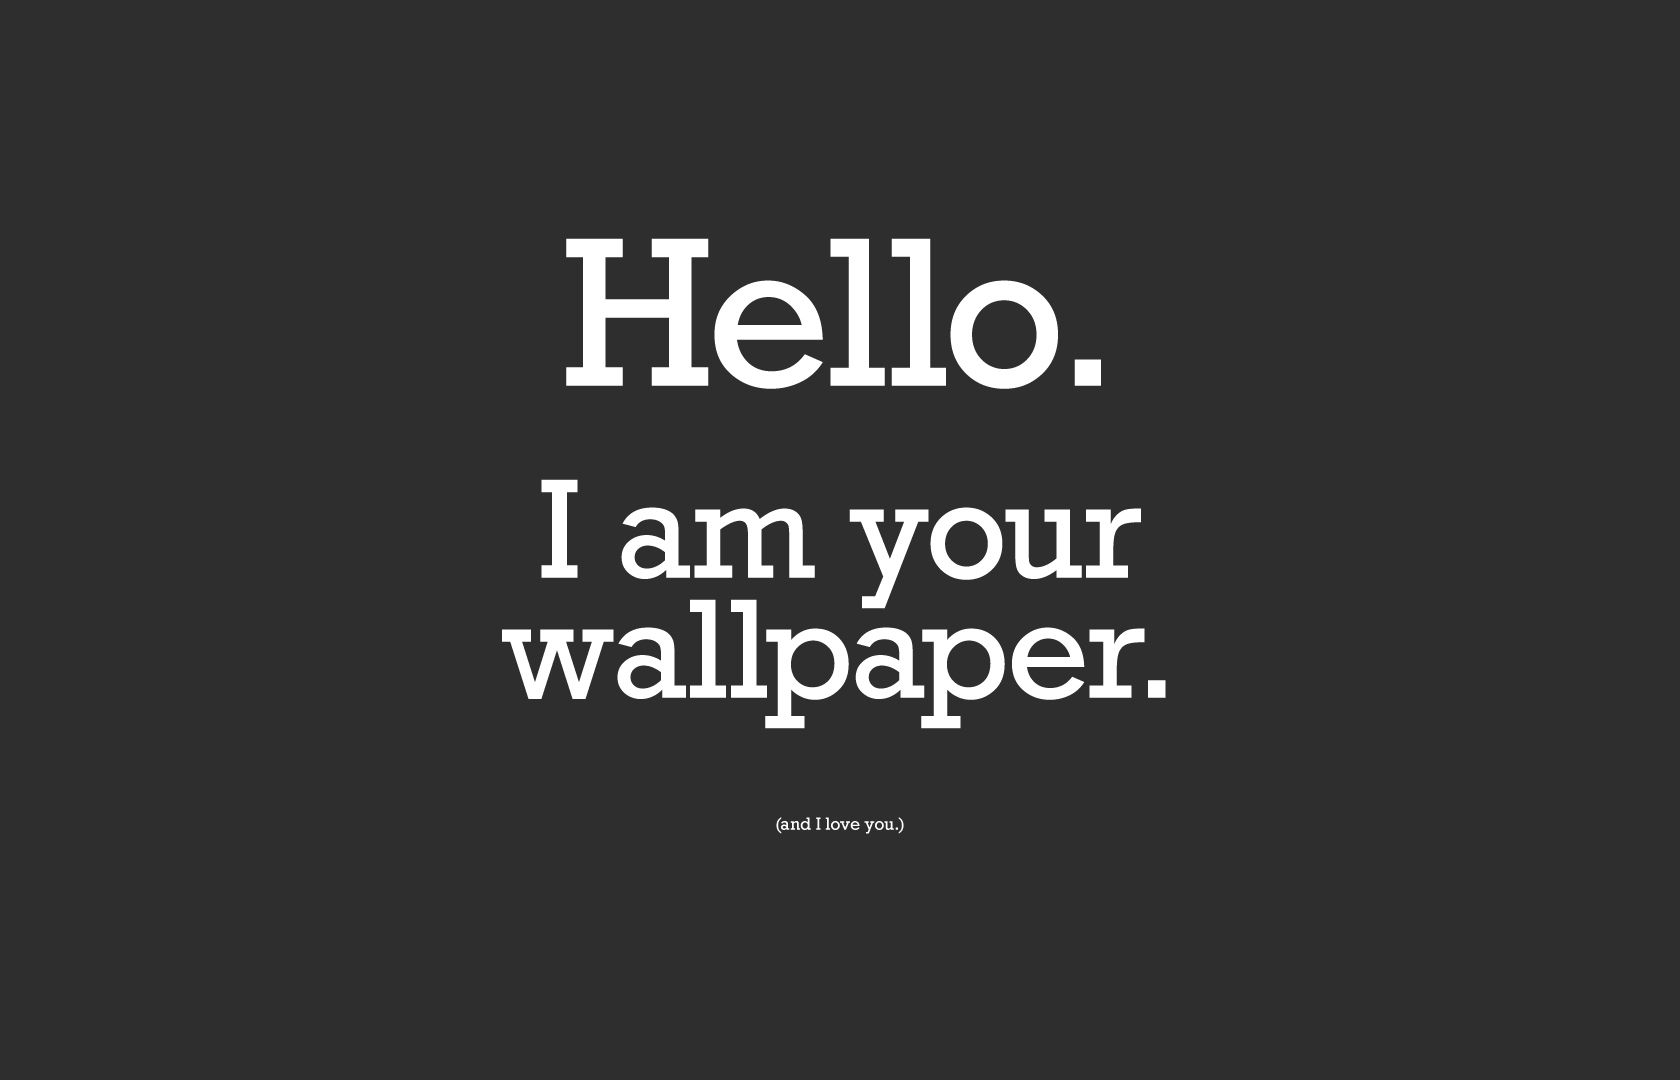 Picture Hello Hd Funny Idwallpics Com Funny Quotes Wallpaper Funny Phone Wallpaper Funny Wallpapers